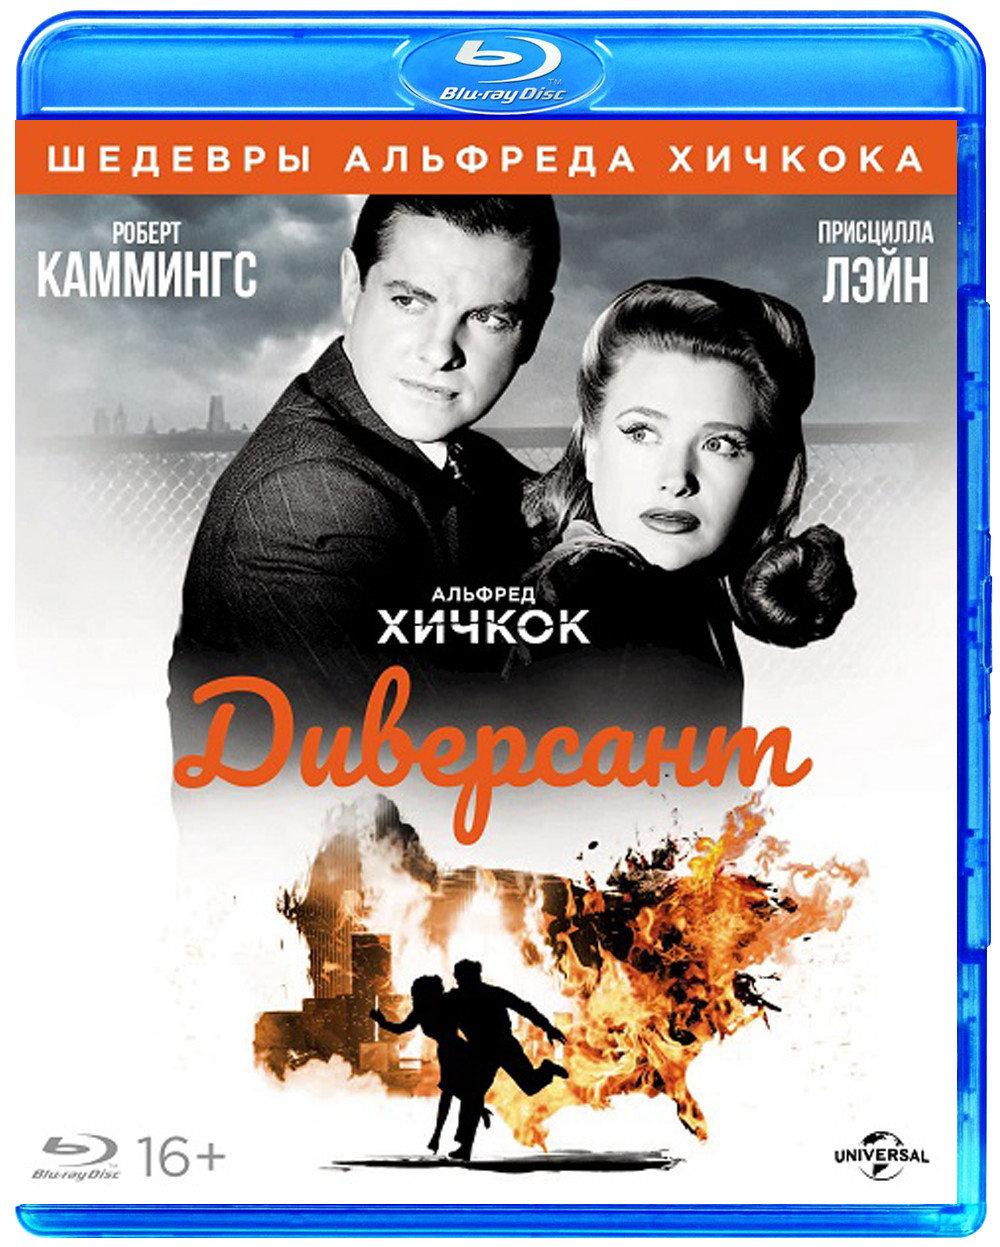 Blu-ray. Шедевры А. Хичкока. Диверсант